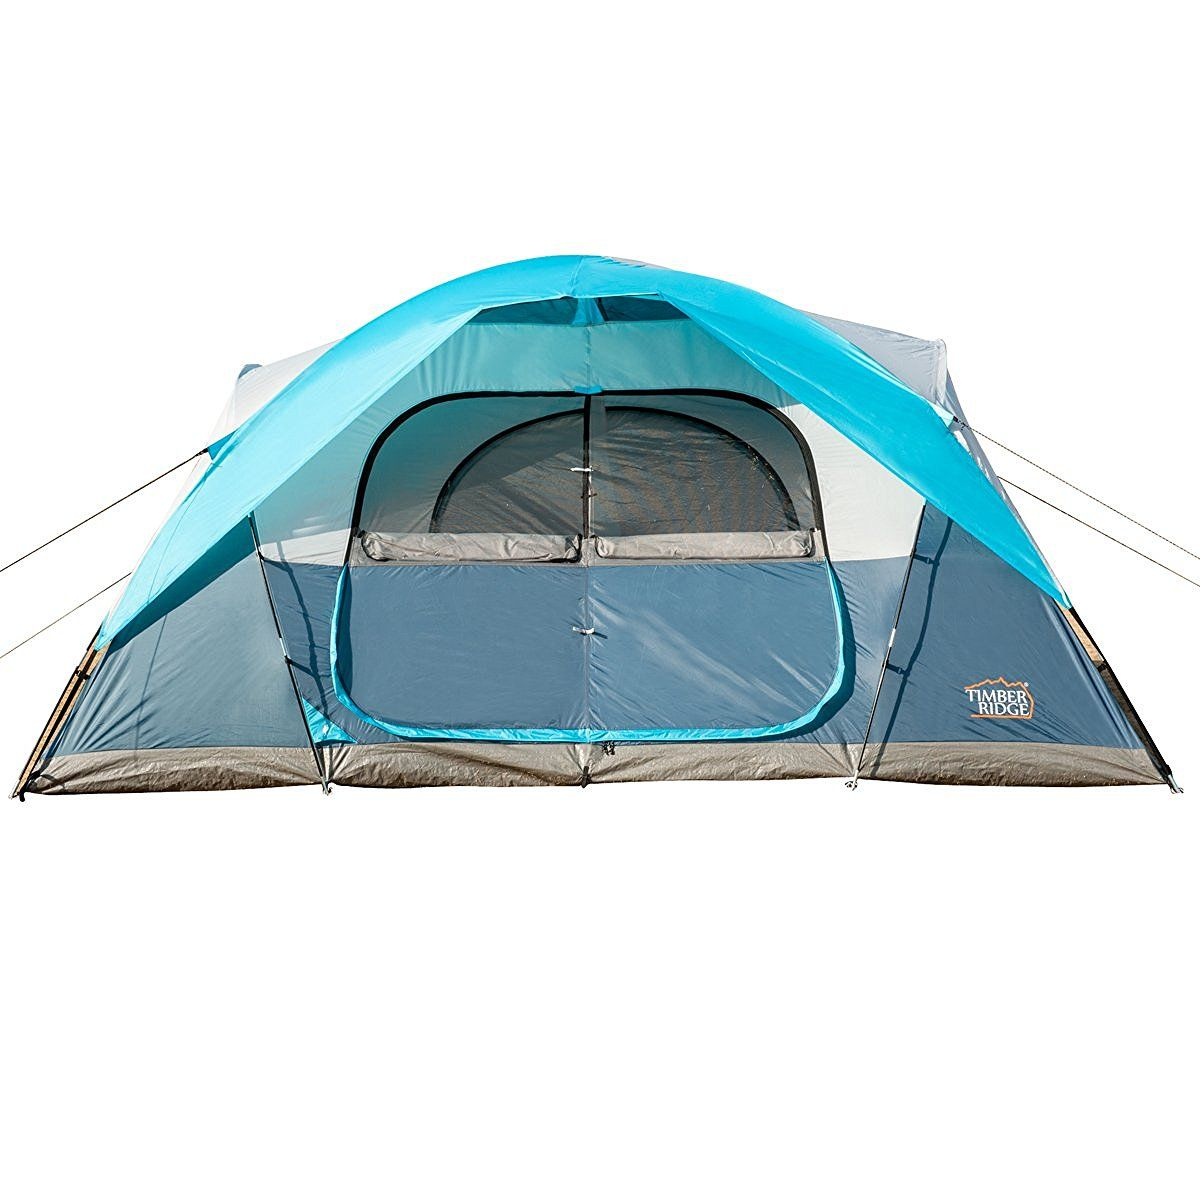 Timber Ridge Large Family Tent for C&ing with Carry Bag 2 Rooms u003eu003eu003e  sc 1 st  Pinterest & Timber Ridge Large Family Tent for Camping with Carry Bag 2 Rooms ...